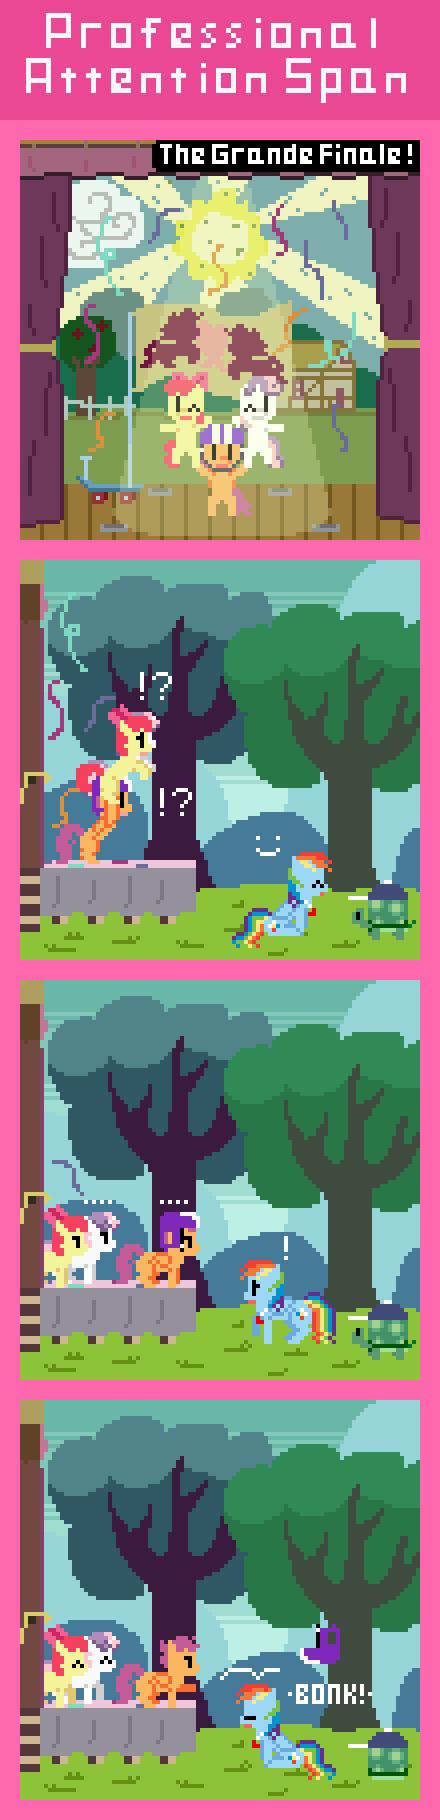 "Professional Attention Span. via zztfox.deviantart.com/art/Professiona... Rainbow Dash:""I promise to stay focused this time!"" CMC:""Promise?"" My Little Pony Cutiemark Crusad Rainbow dash retro comic"